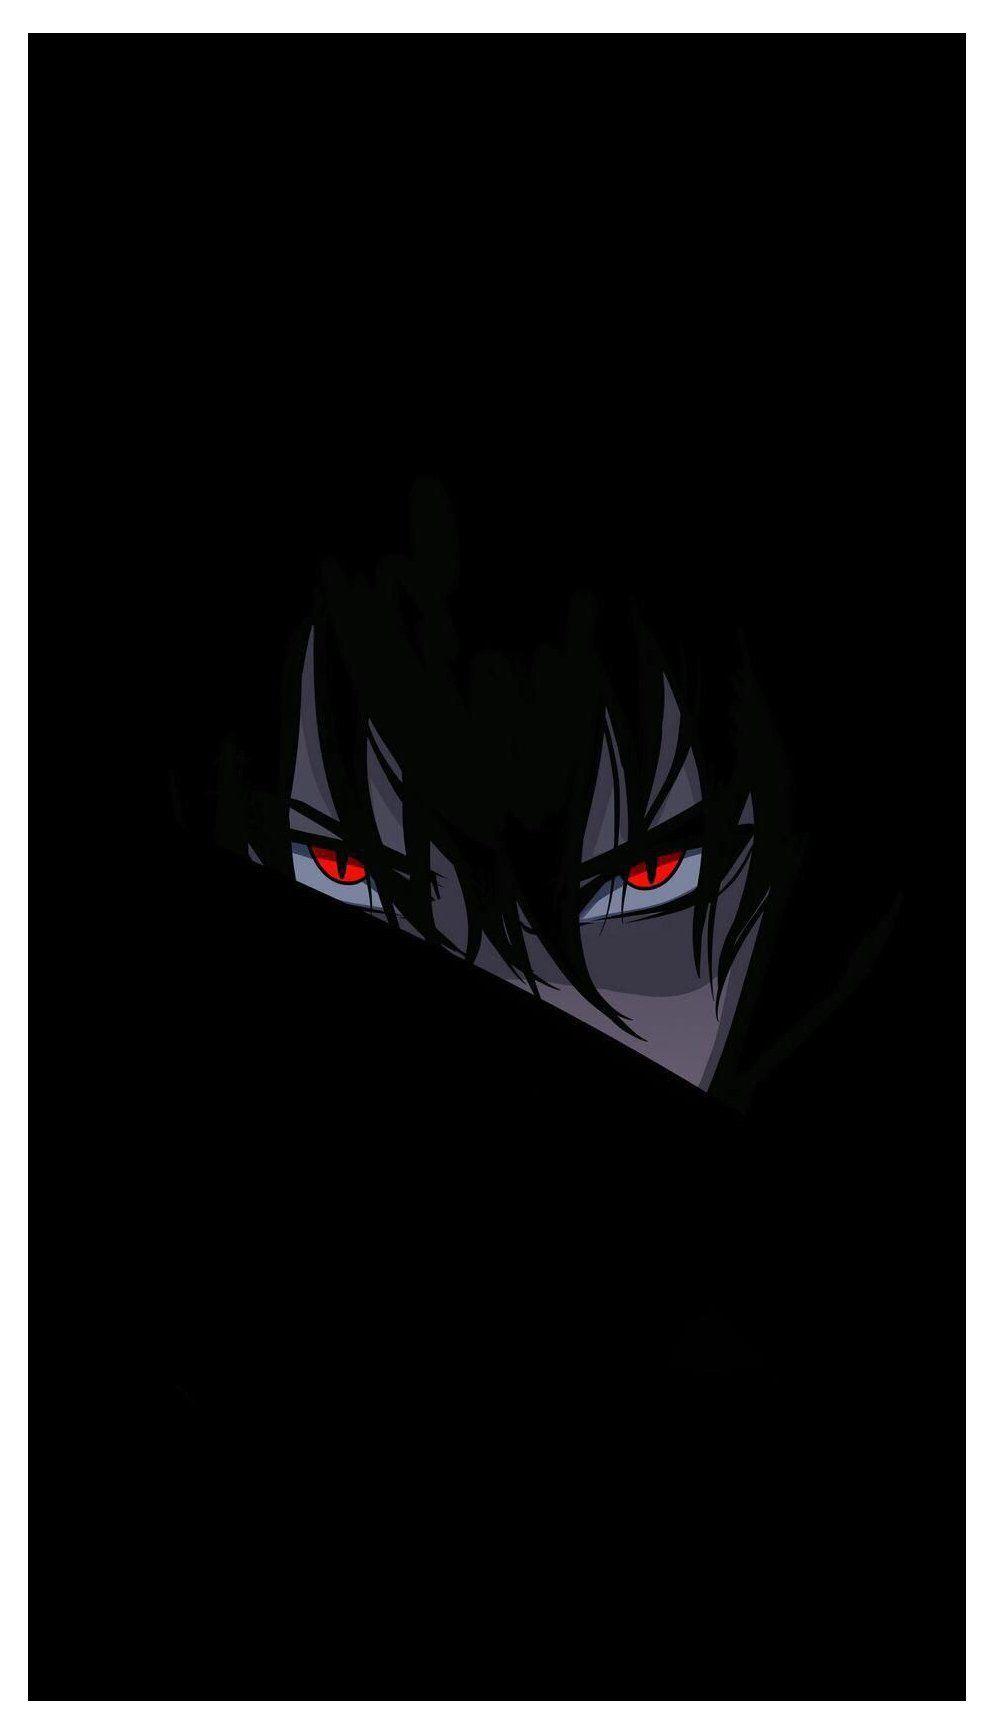 Reddit Iwallpaper Sasuke Cool Anime Wallpaper Hd Coolanimewallpaperhd In 2021 Cool Anime Wallpapers Anime Wallpaper Scary Wallpaper